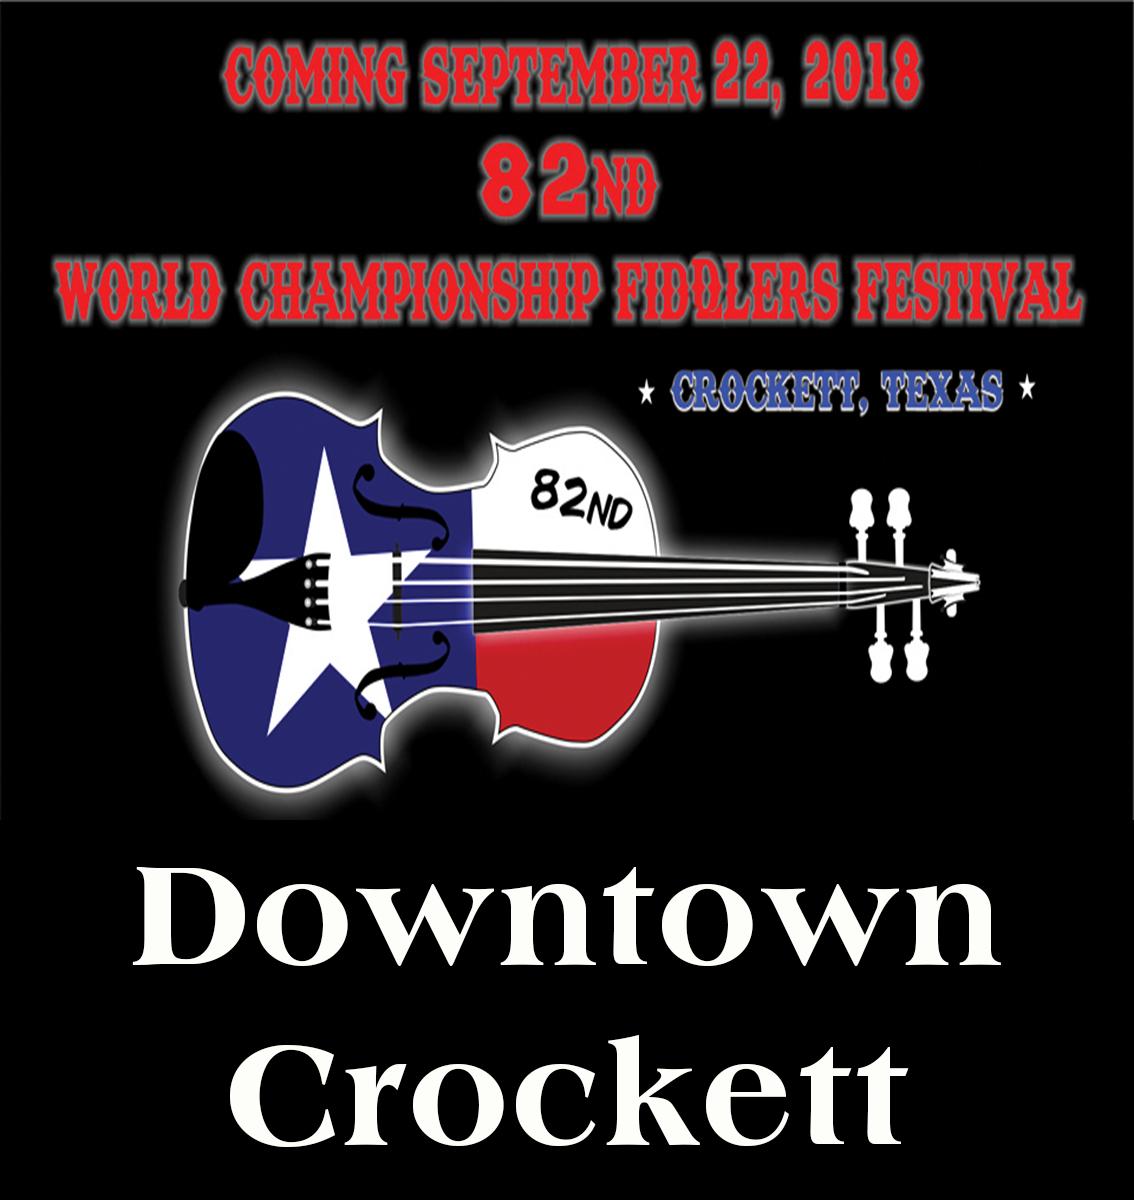 Fiddlers-Festival-web-ad.jpg